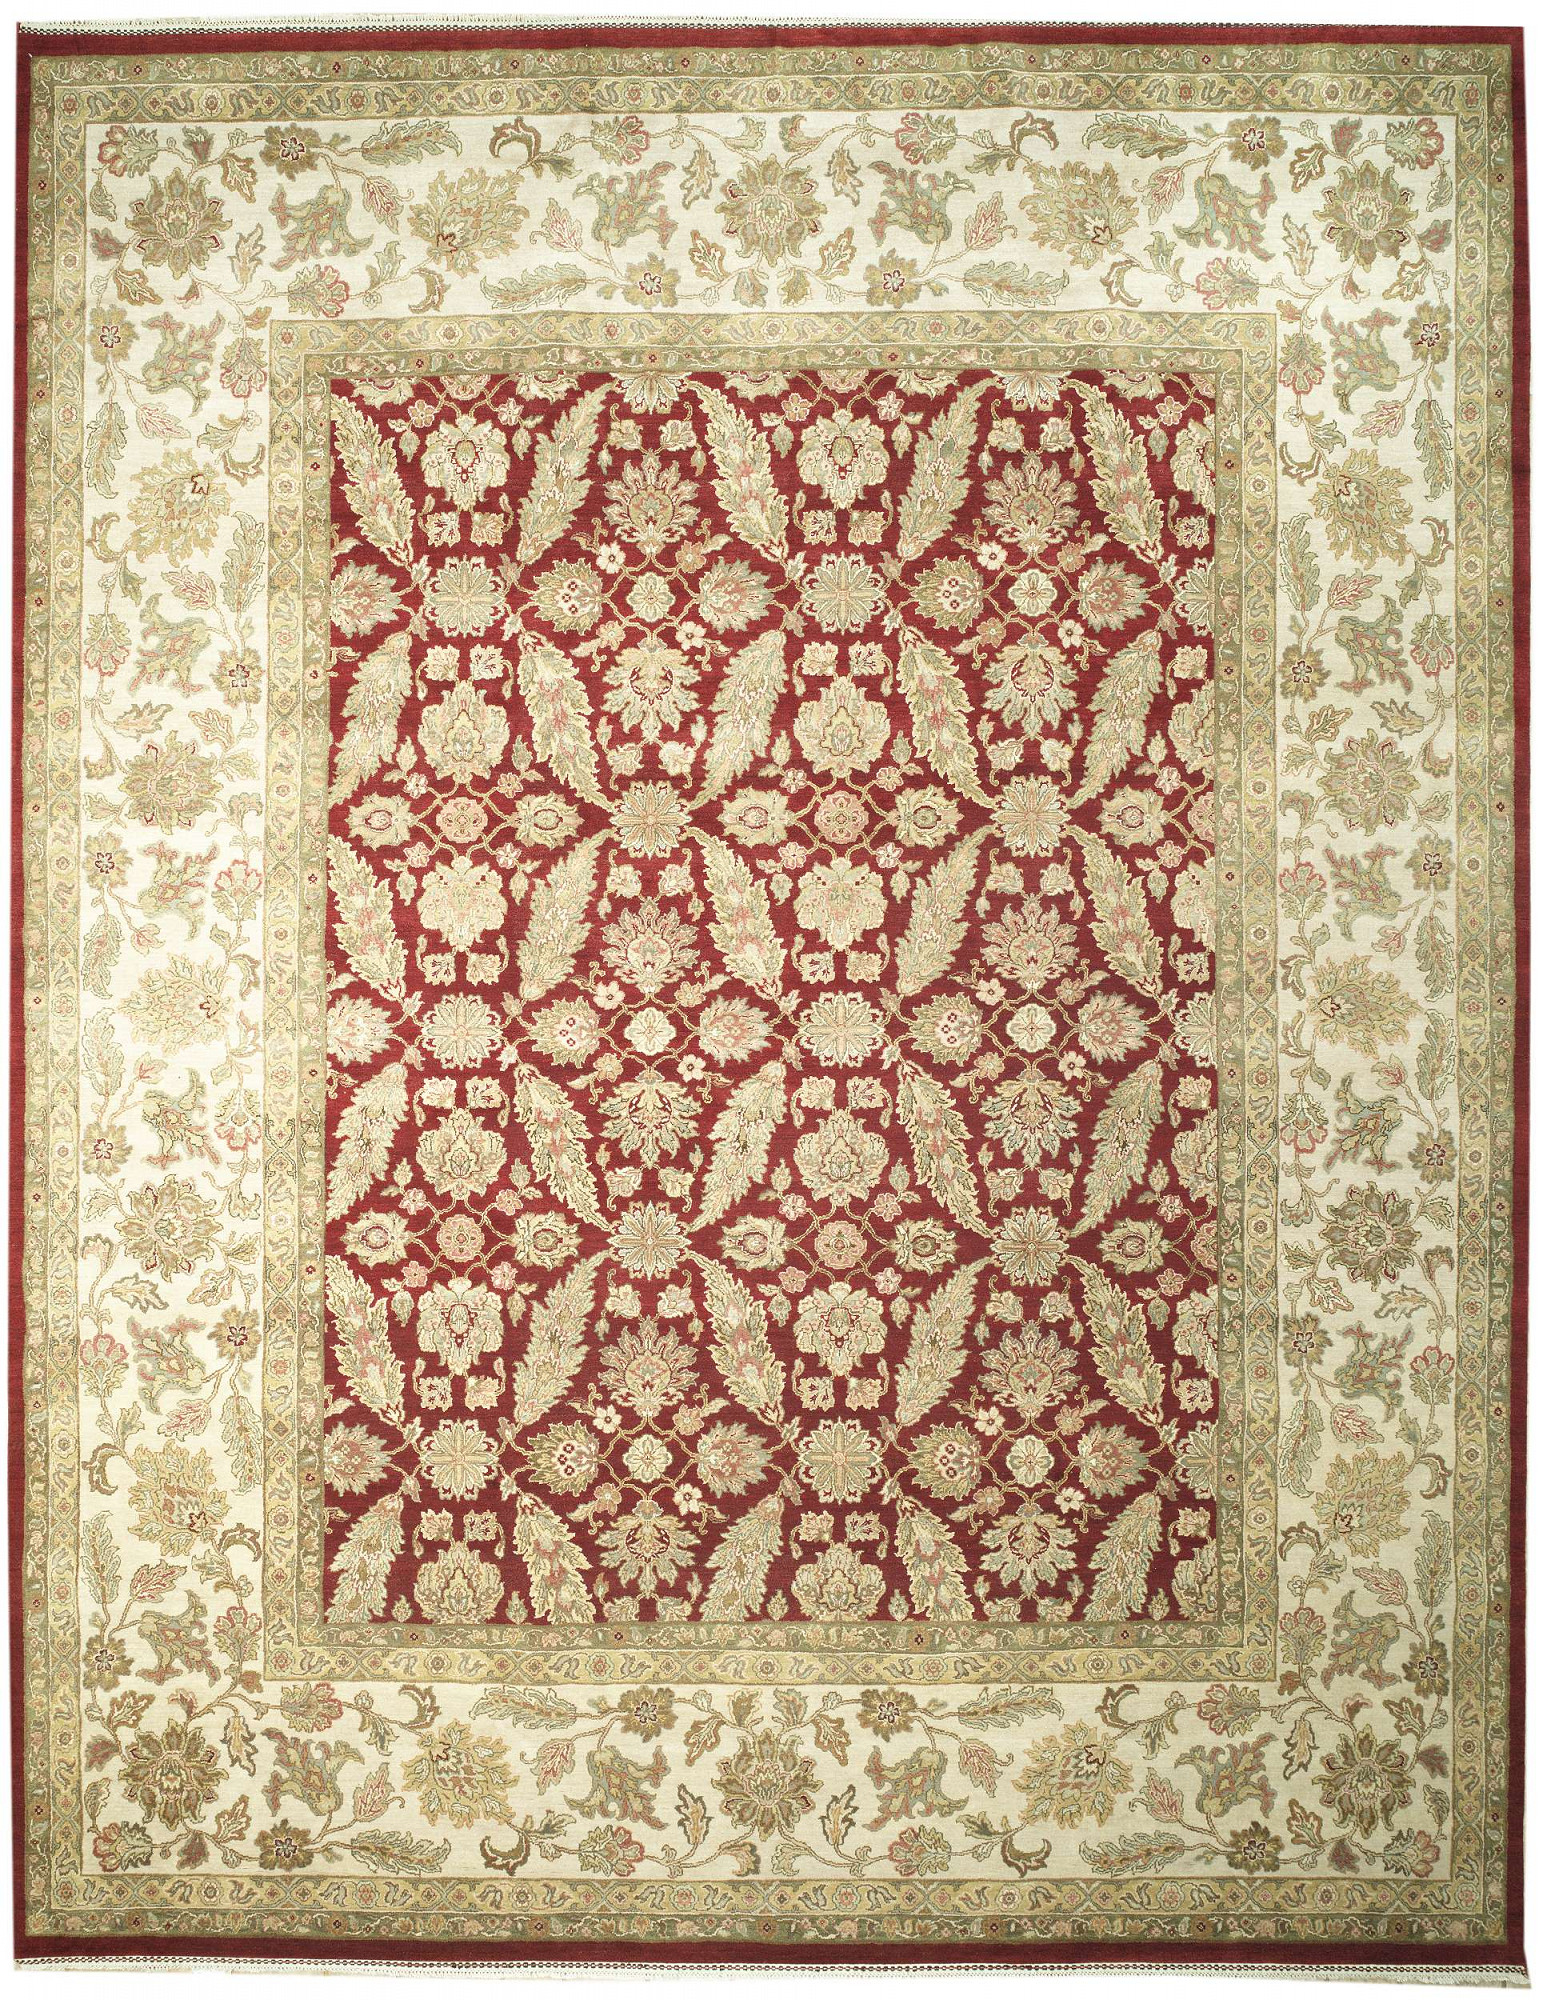 Agra Rectangle 12x15